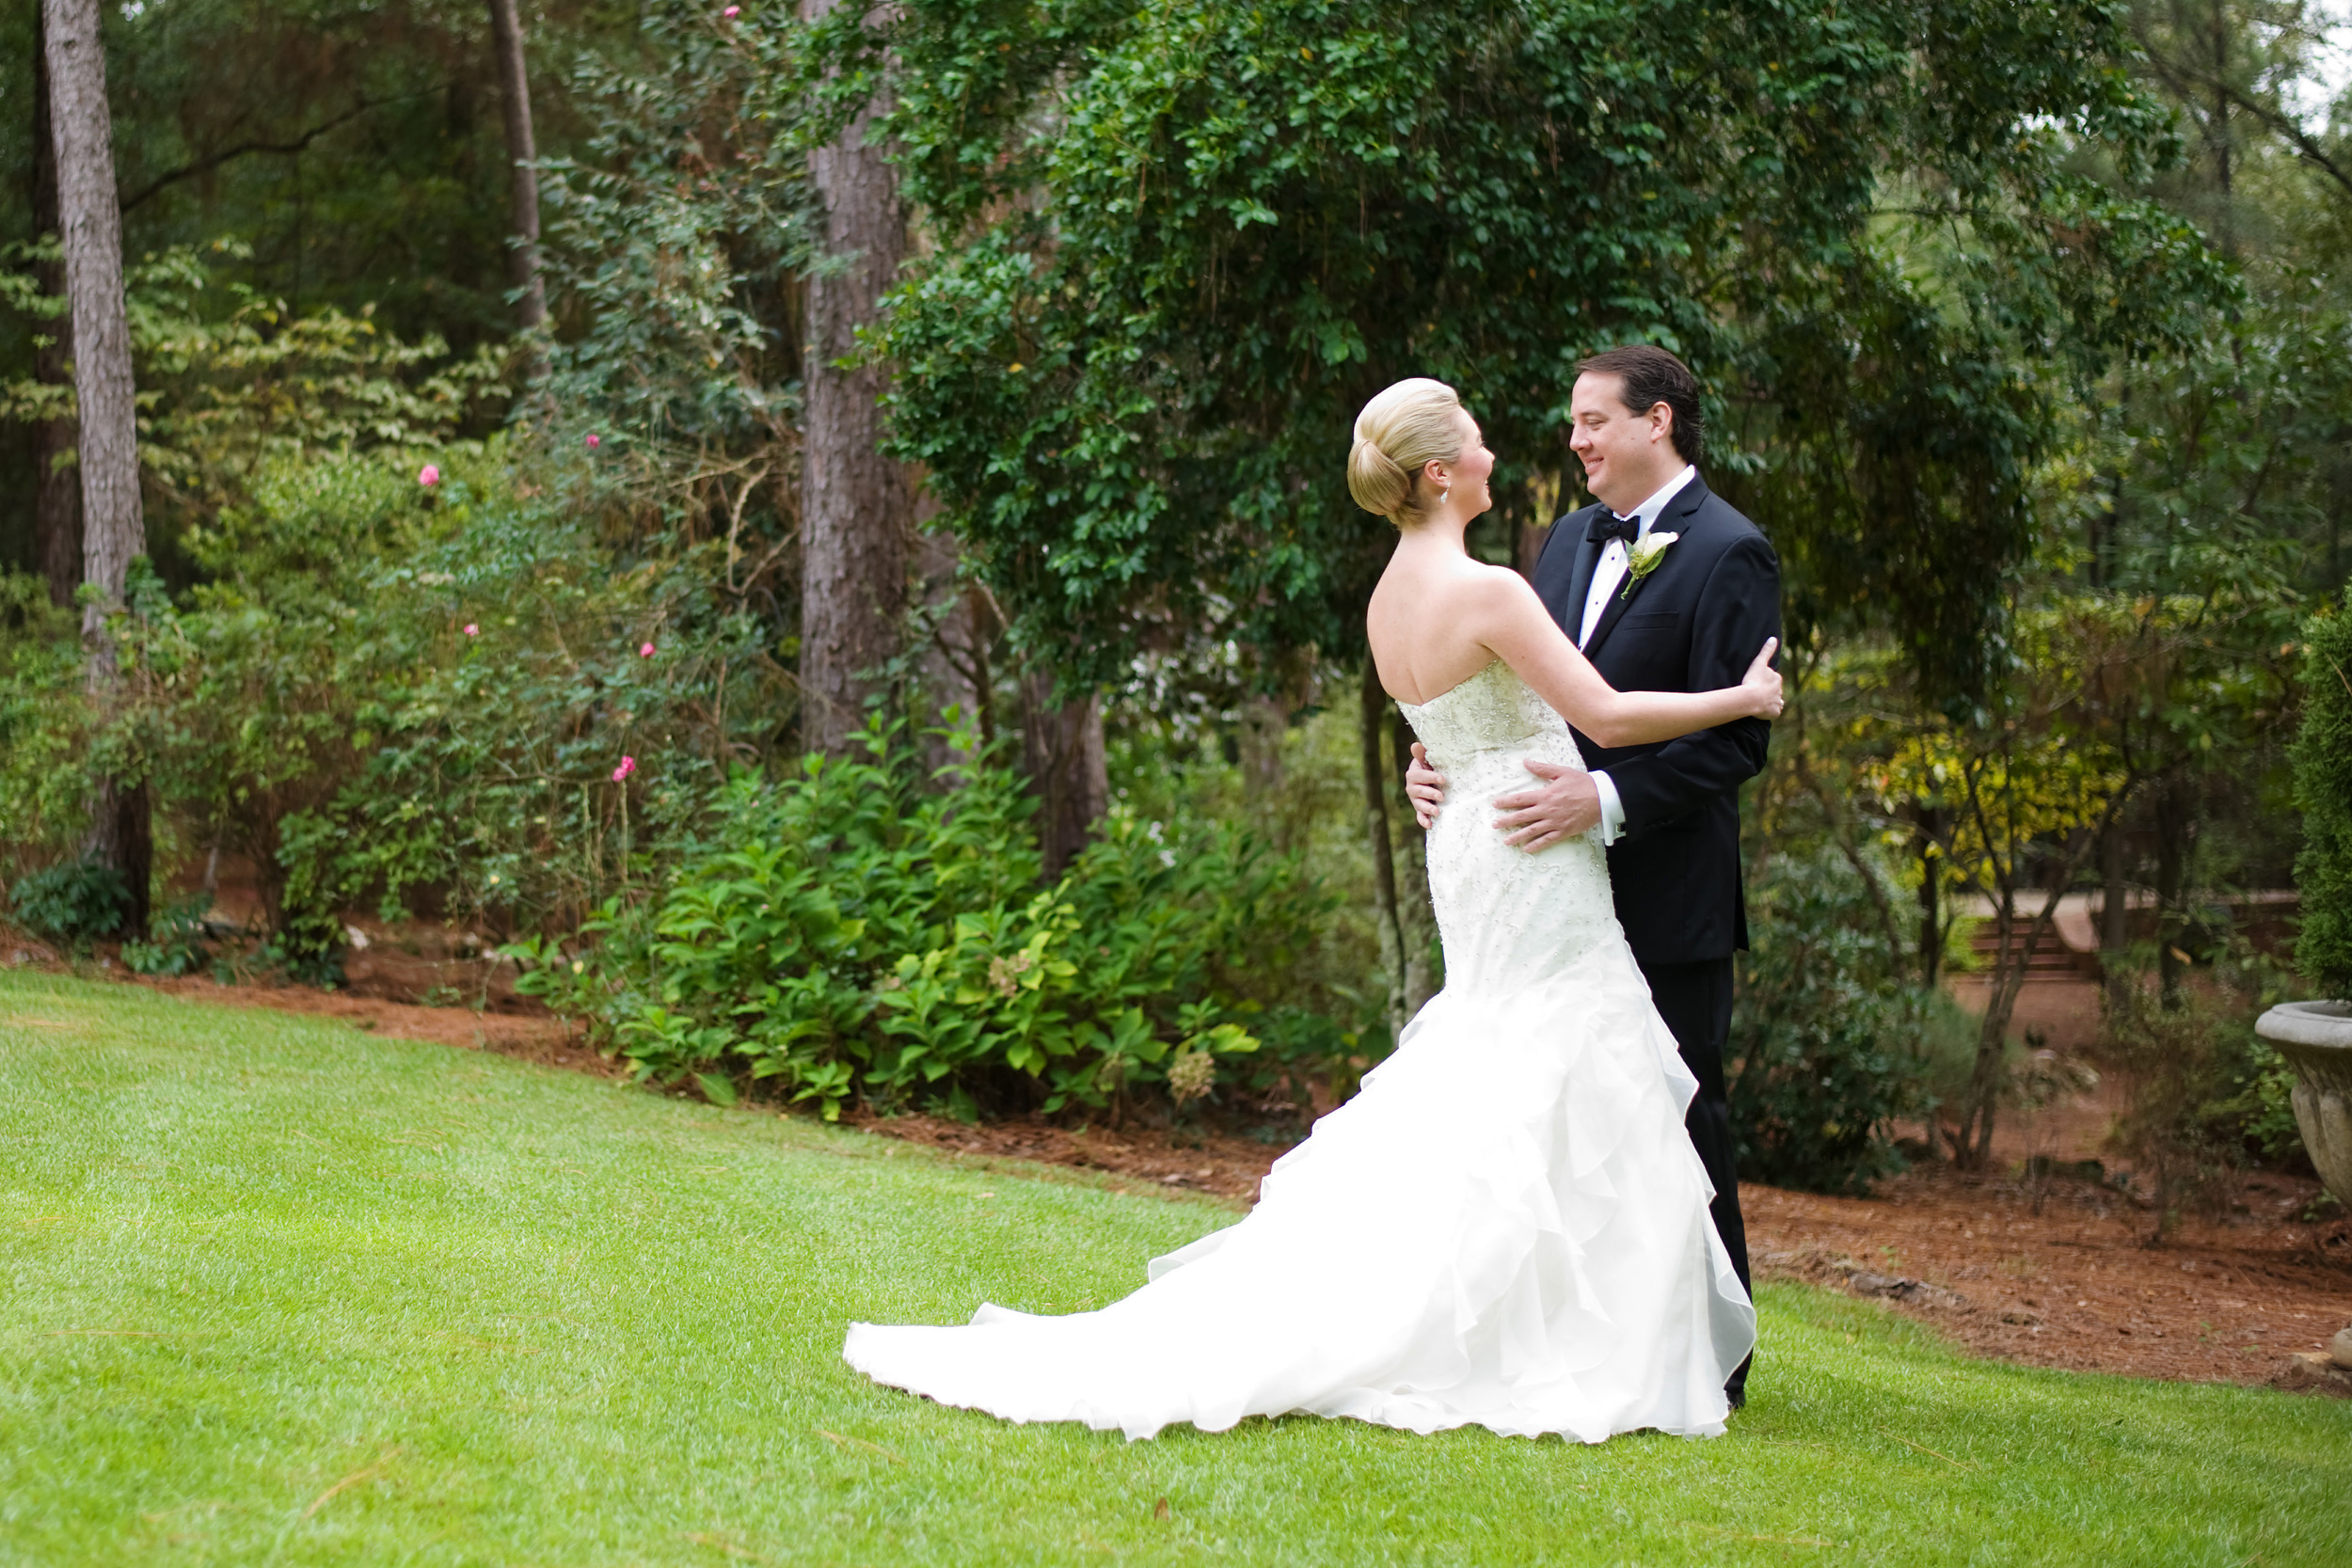 Handley Breaux Designs | Alabama Wedding | Simple Color Photography | Alabama Wedding Planner | Enterprise Wedding | Southern Wedding | Southern Wedding Planner | Classic Wedding